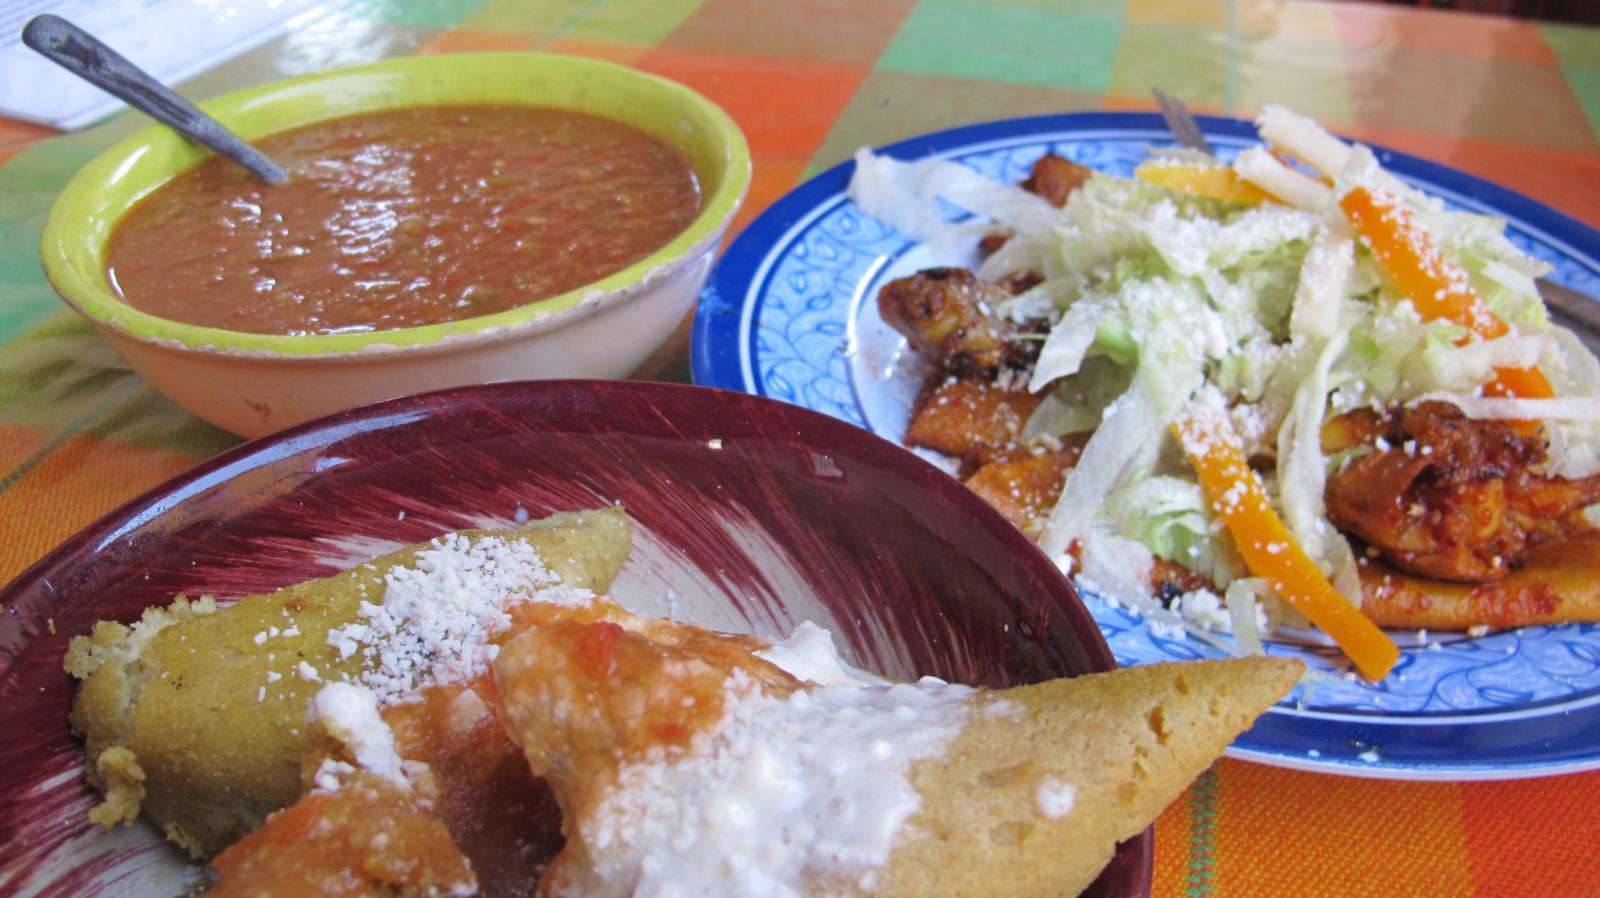 Food from Morelia: corundas, enchiladas